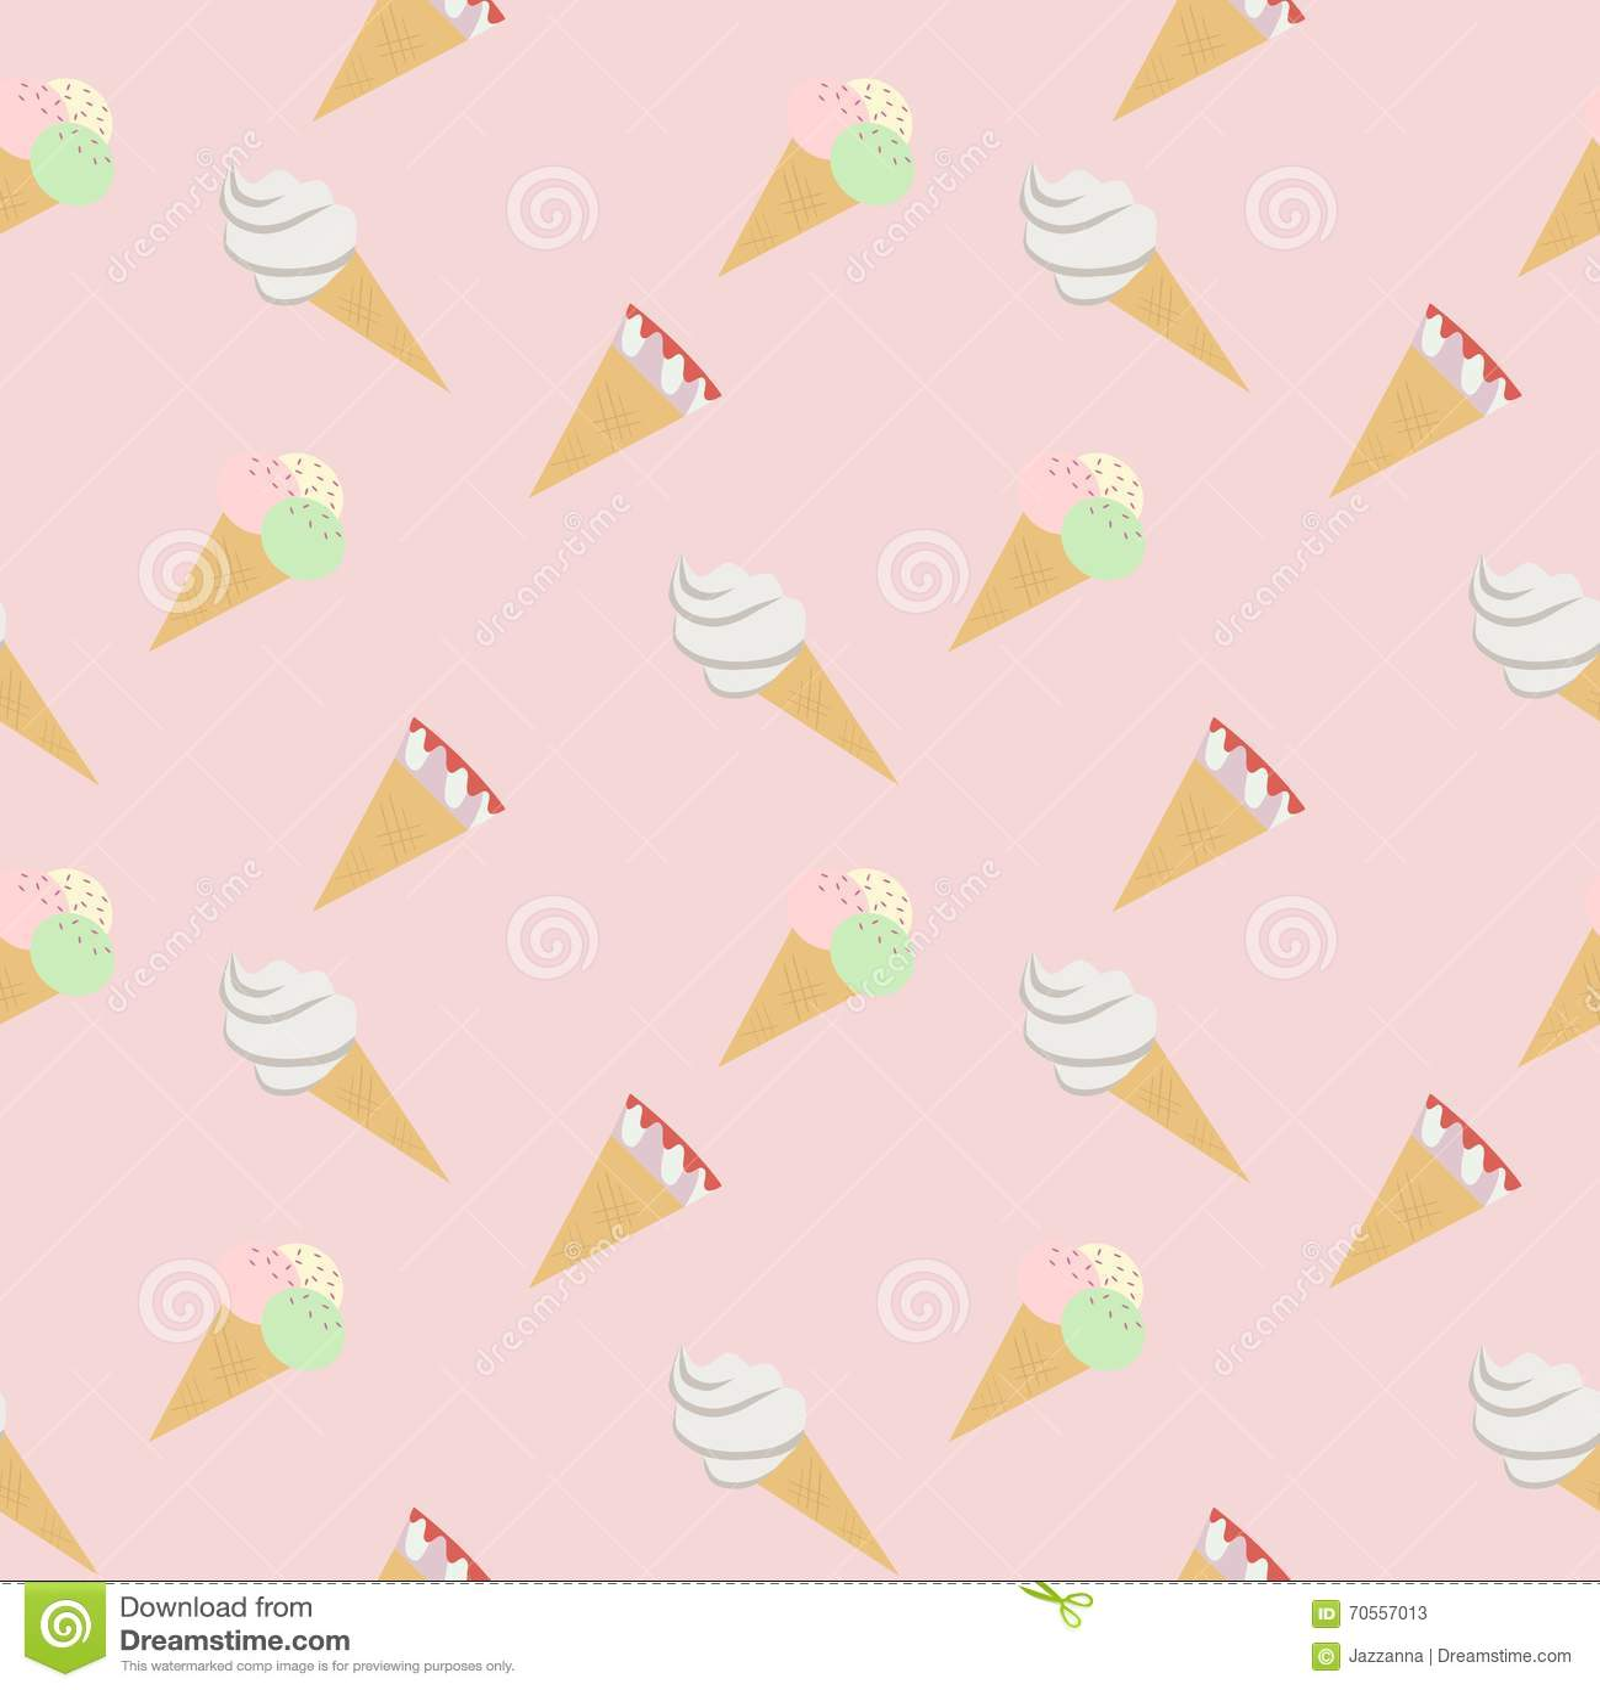 Ice Cream Cones Seamless Pattern Background Stock Vector: Seamless Pattern Ice Cream Cones Pink Stock Vector